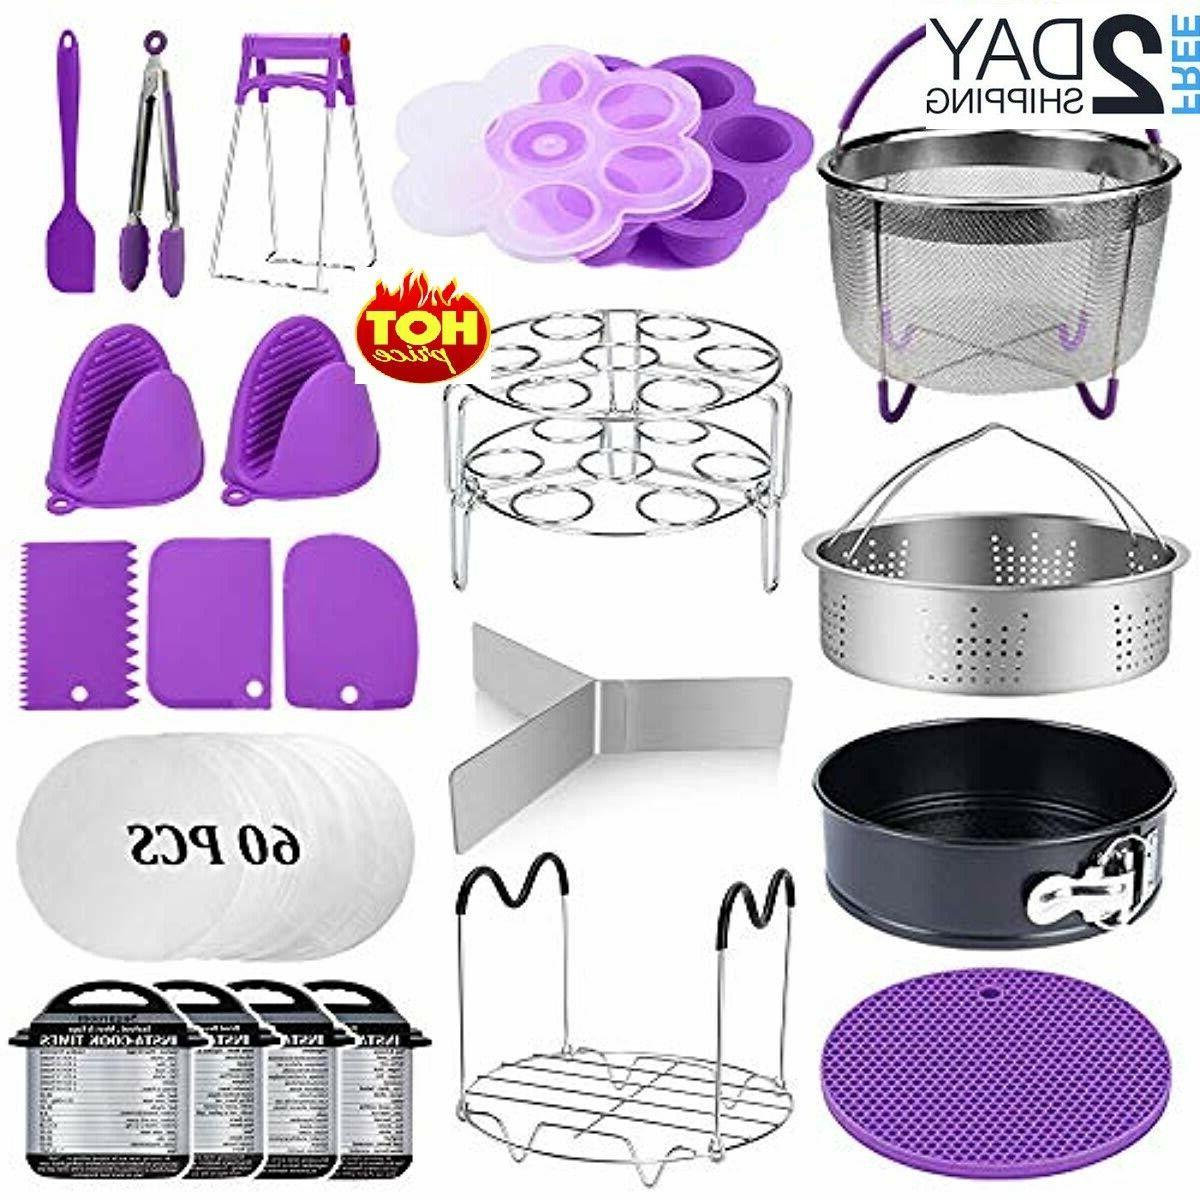 22 pcs pressure cooker accessories set compatible